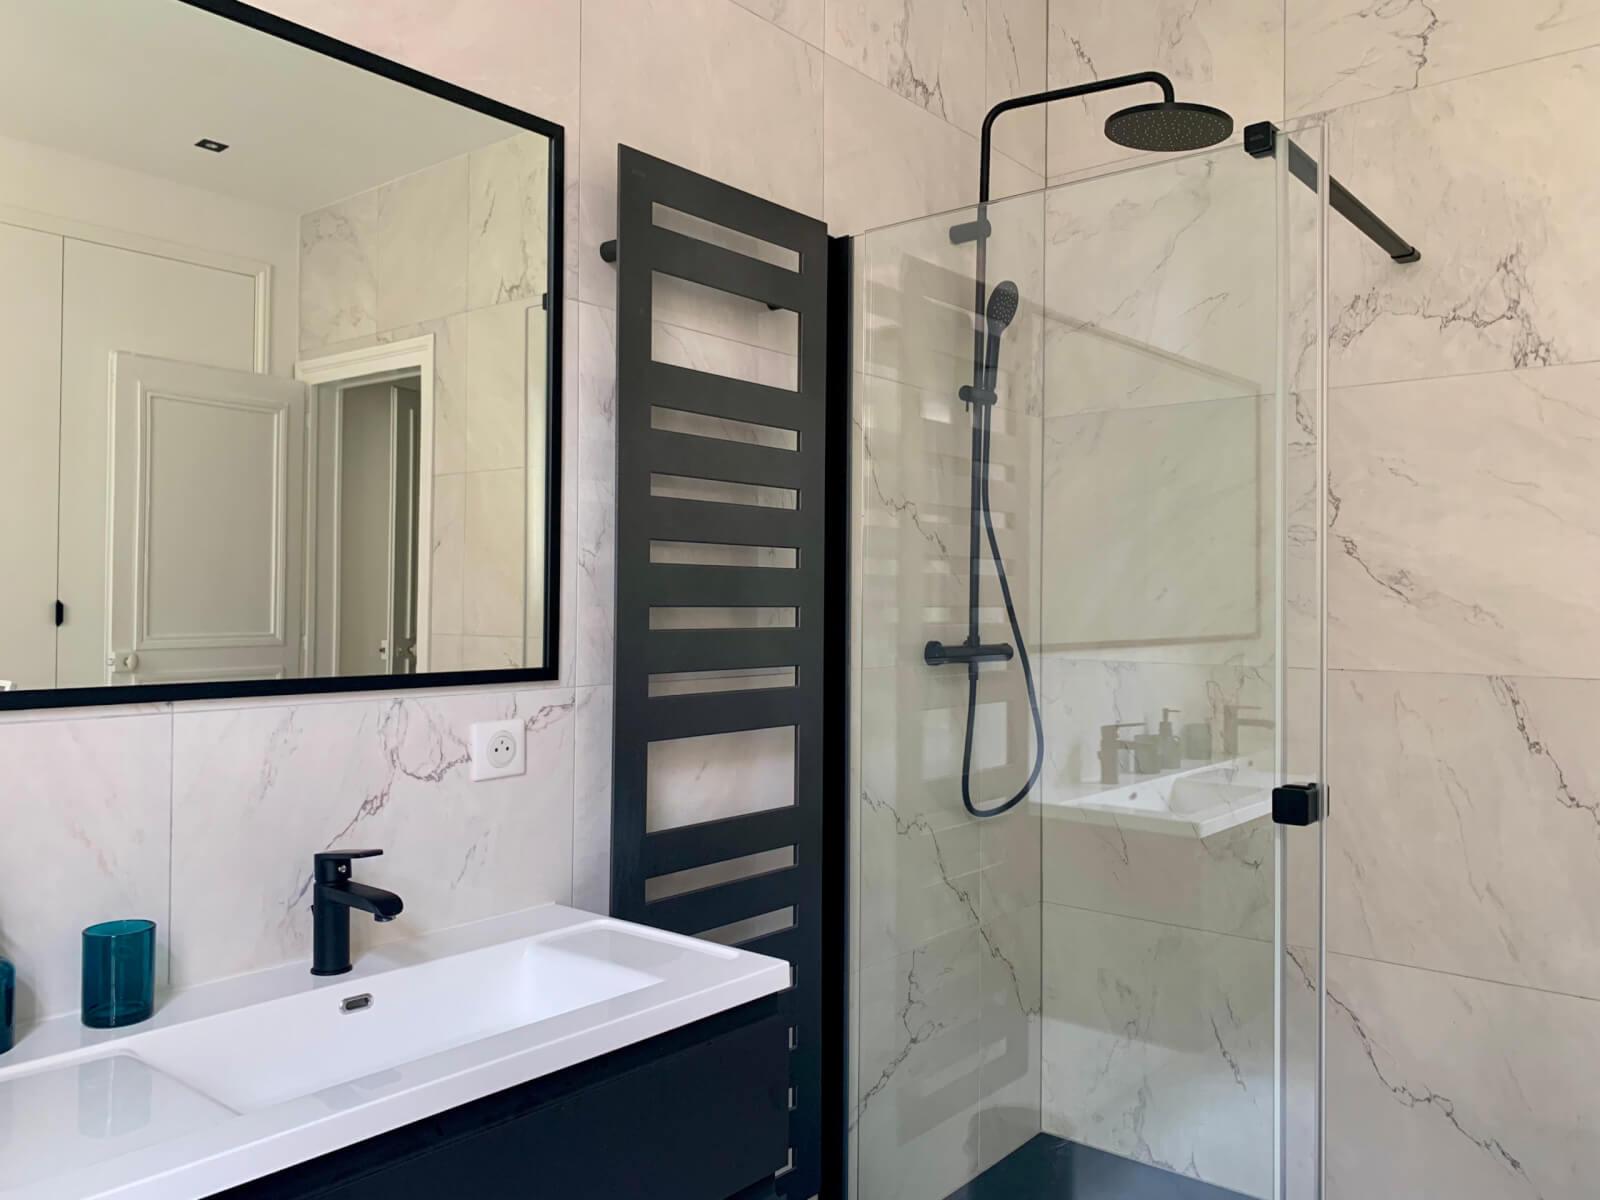 Trabeco Lorraine La salle de bain moderne, lumineuse et design